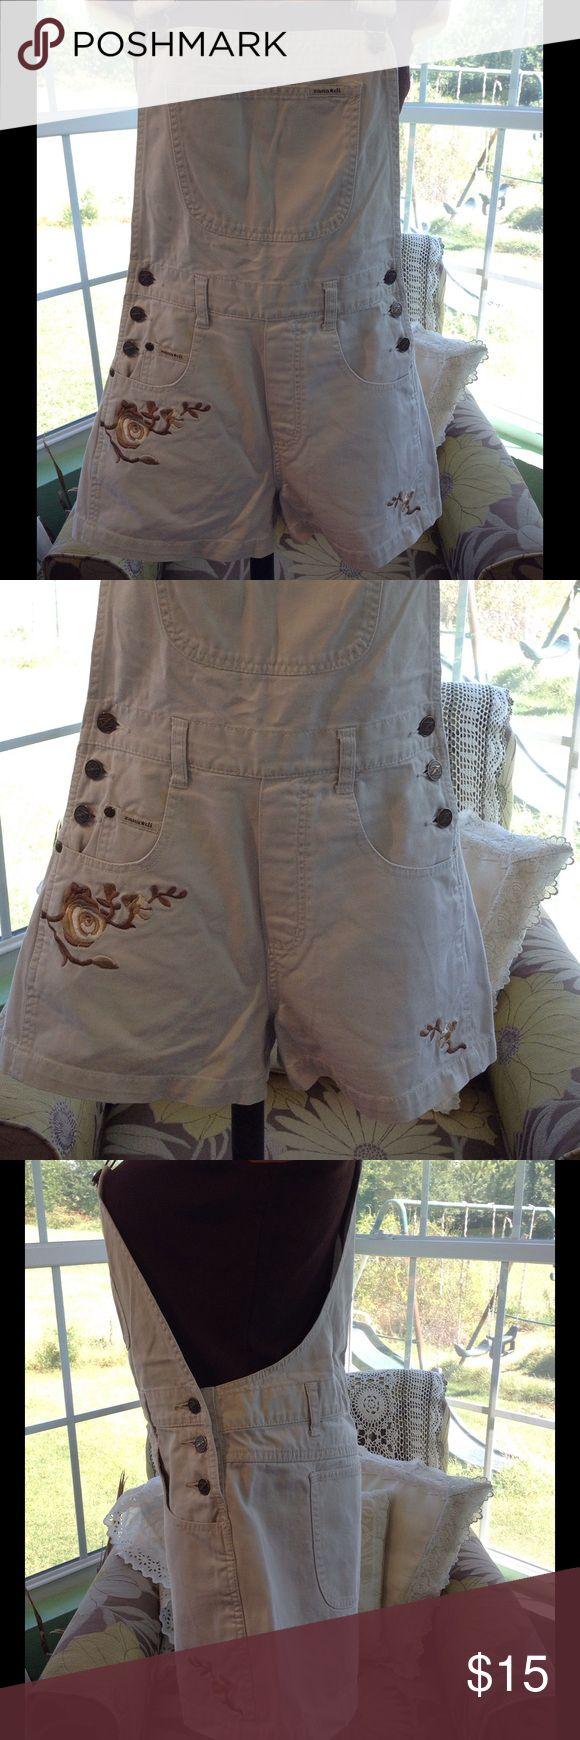 REDUCED Zana Di Khaki Embroidery Overall Short These are really cute and in beautiful condition. Zana di Jeans Overalls